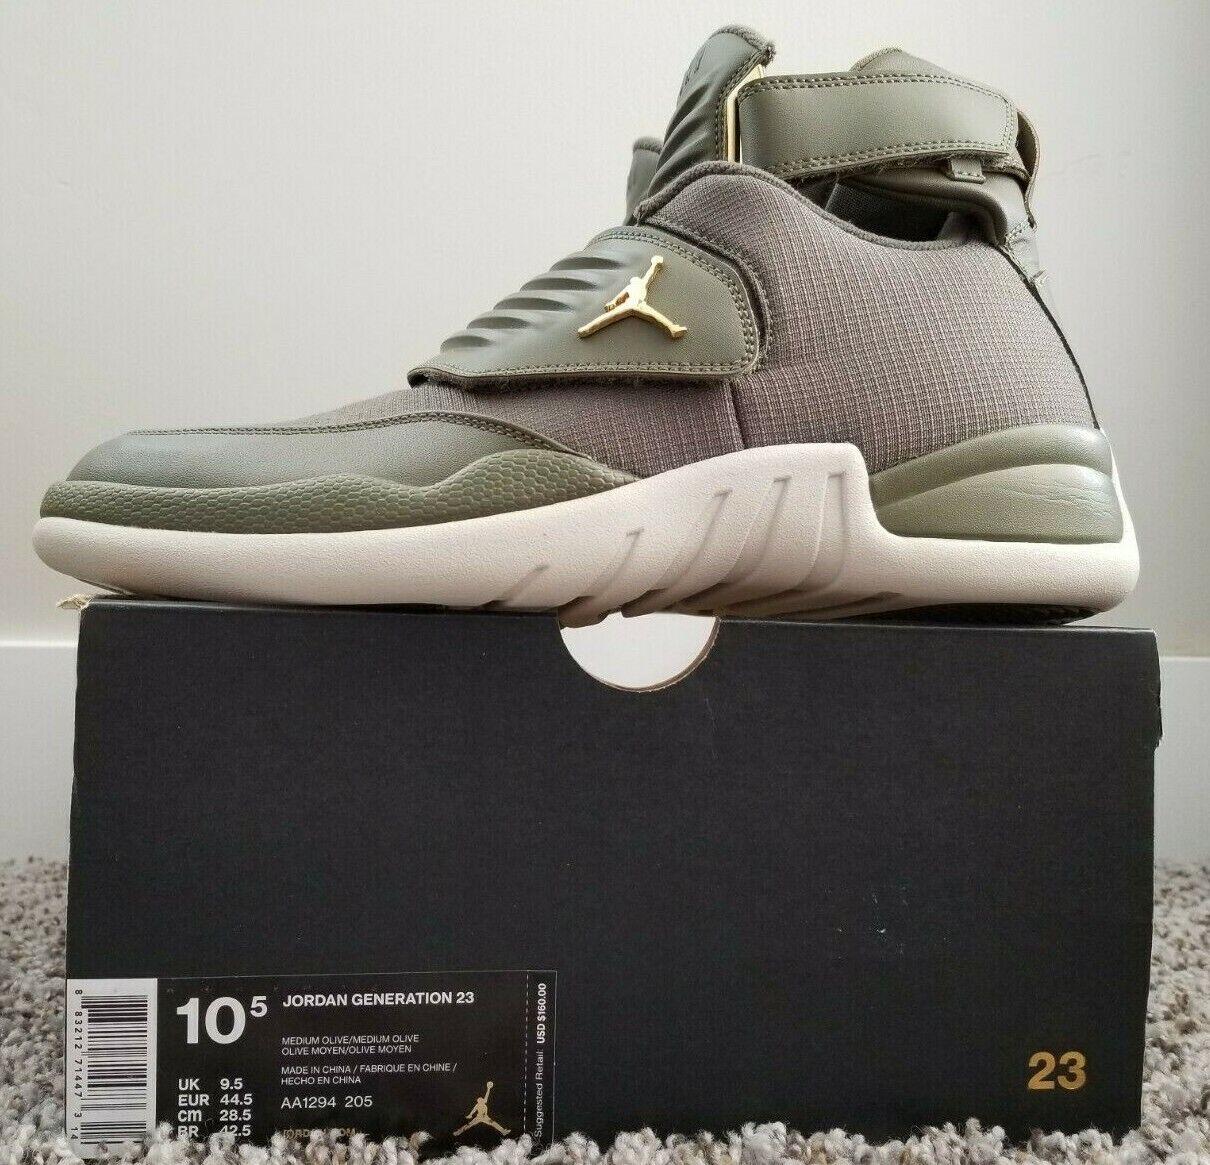 Nike Air Jordan Generation 23 Basketball shoes Olive Green AA1294-205 Men's 10.5